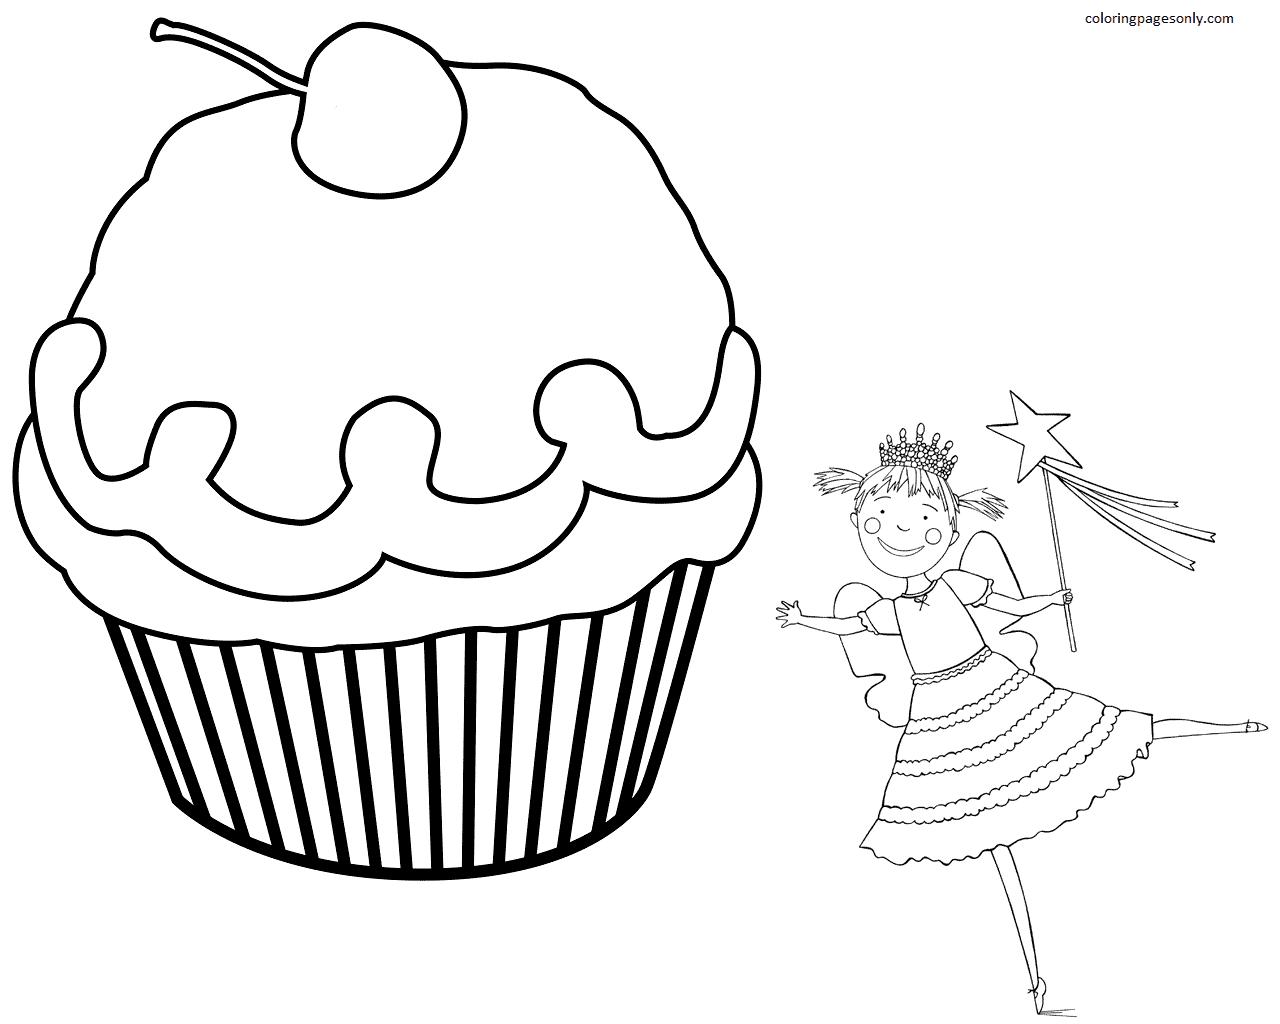 Pinkalicious and Birthday Cupcake Coloring Page